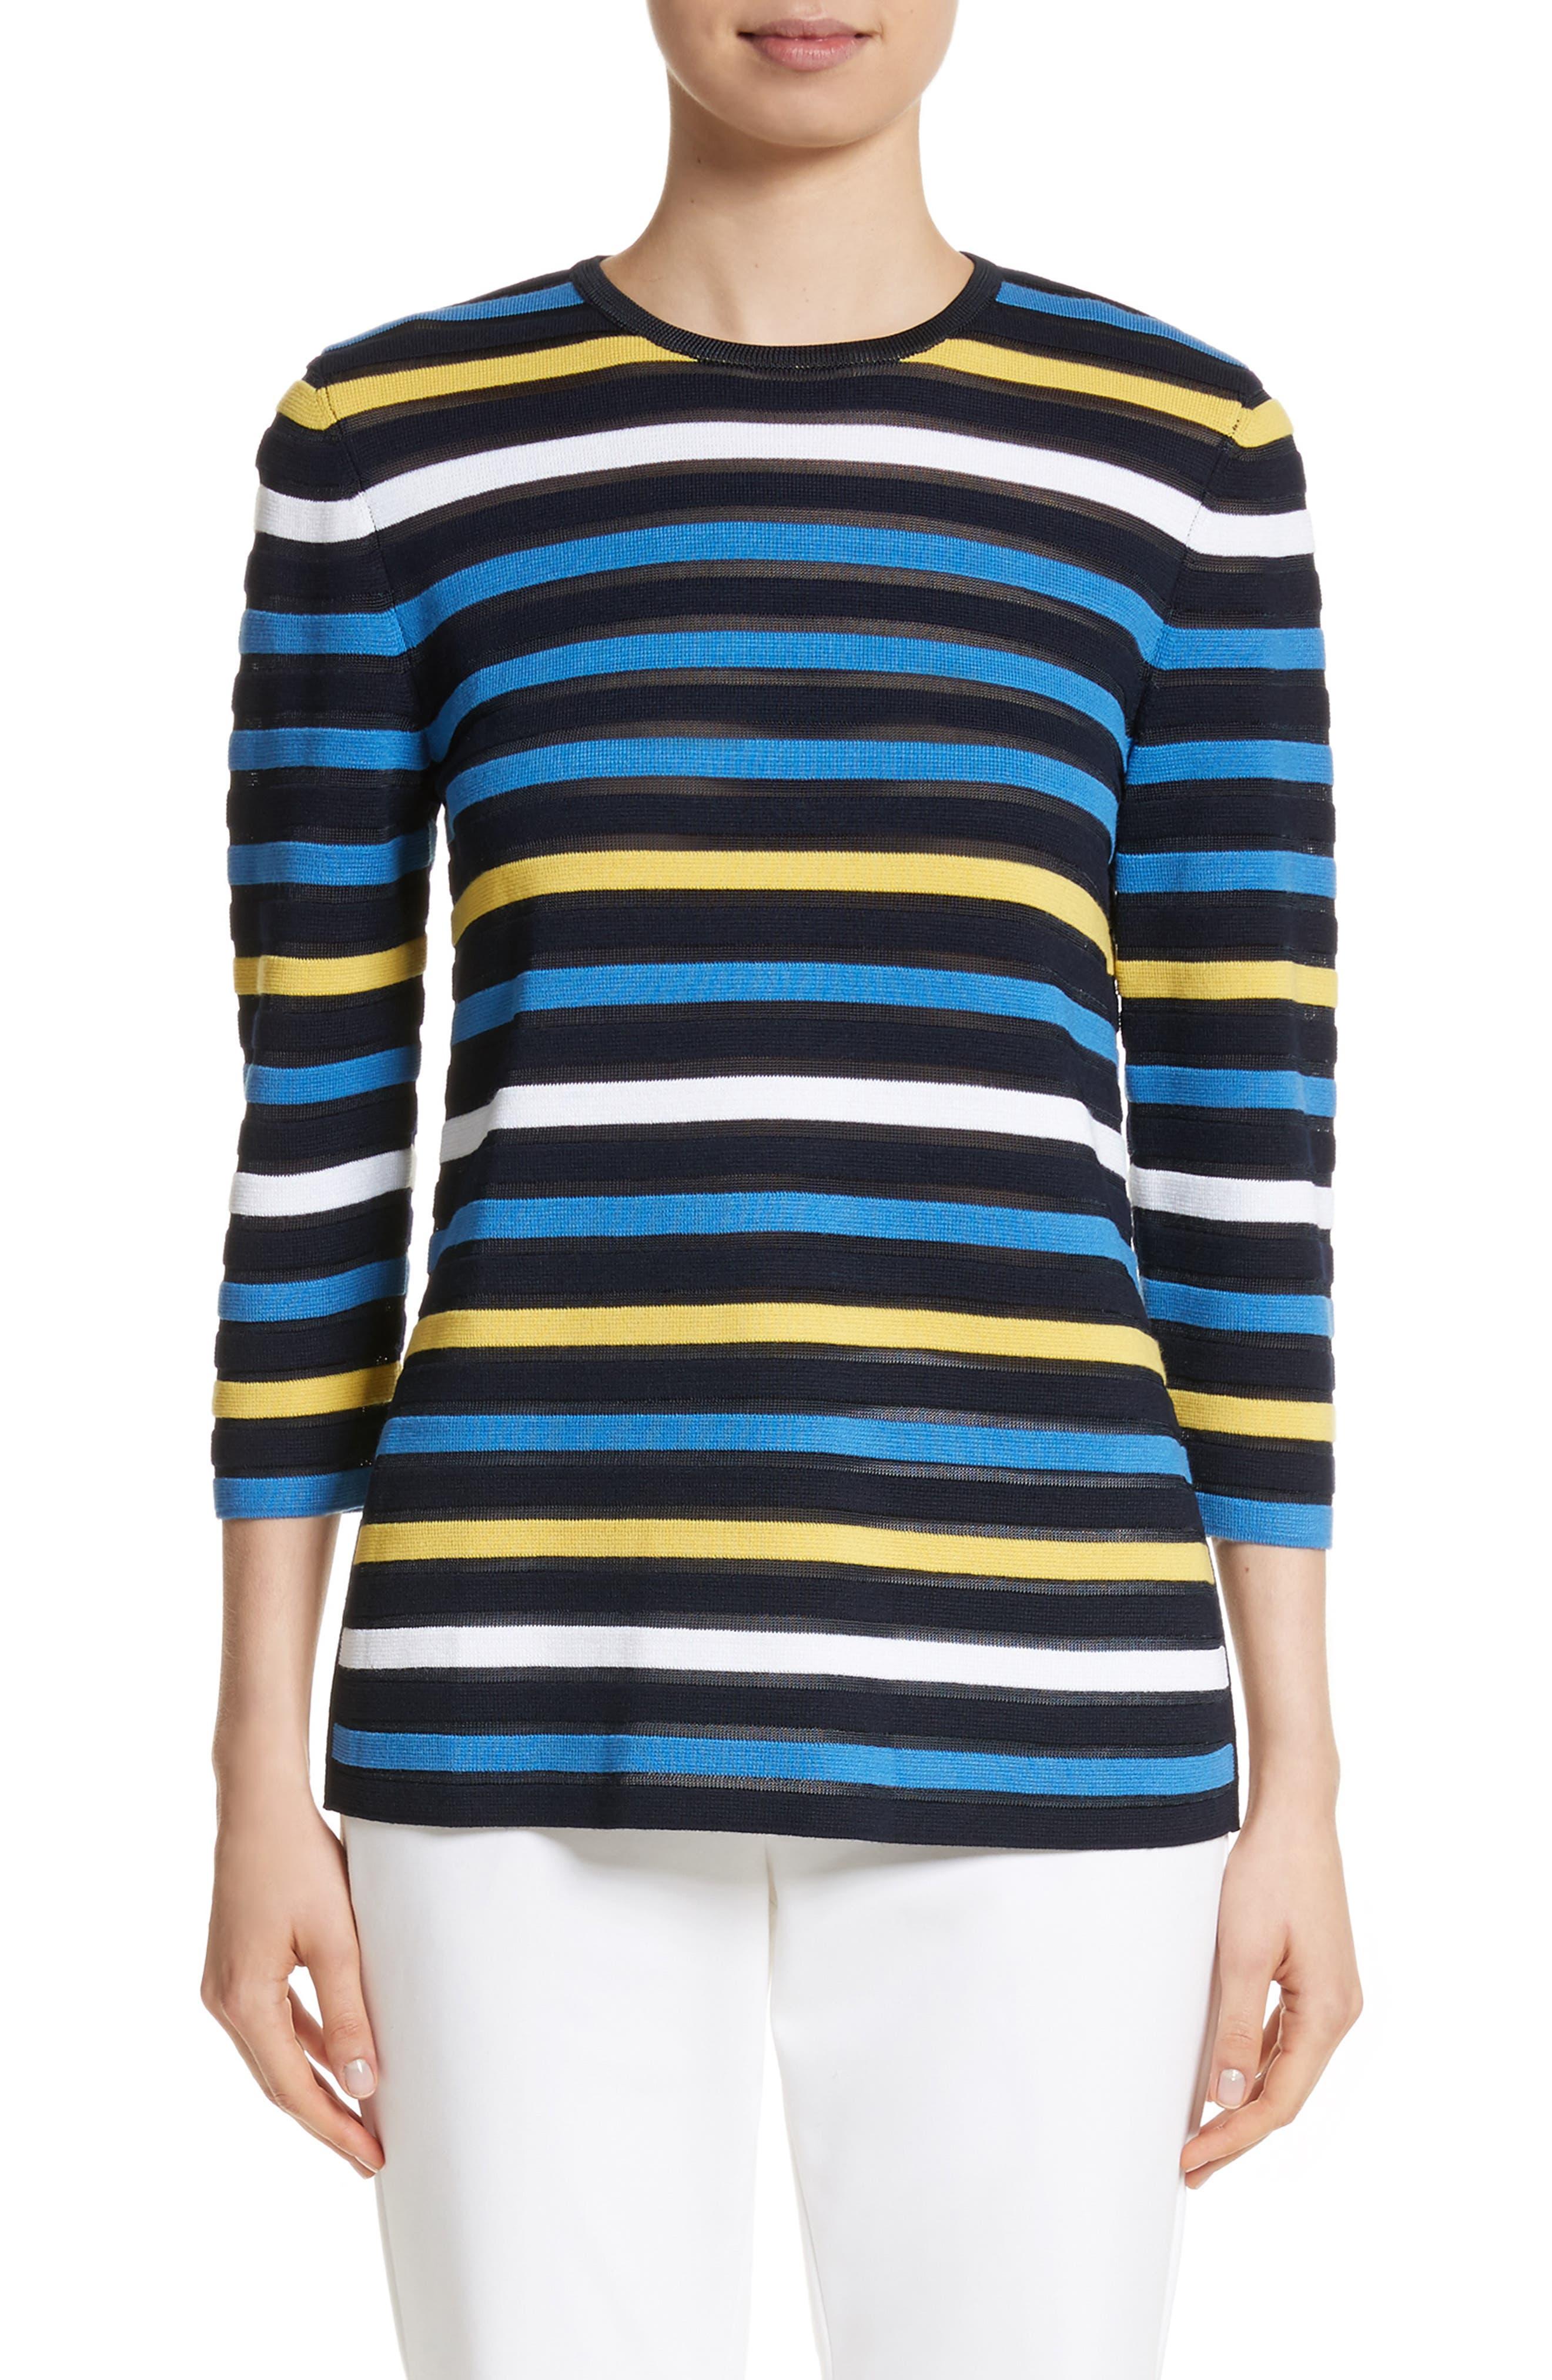 Ombré Stripe Sweater,                             Main thumbnail 1, color,                             Navy Multi